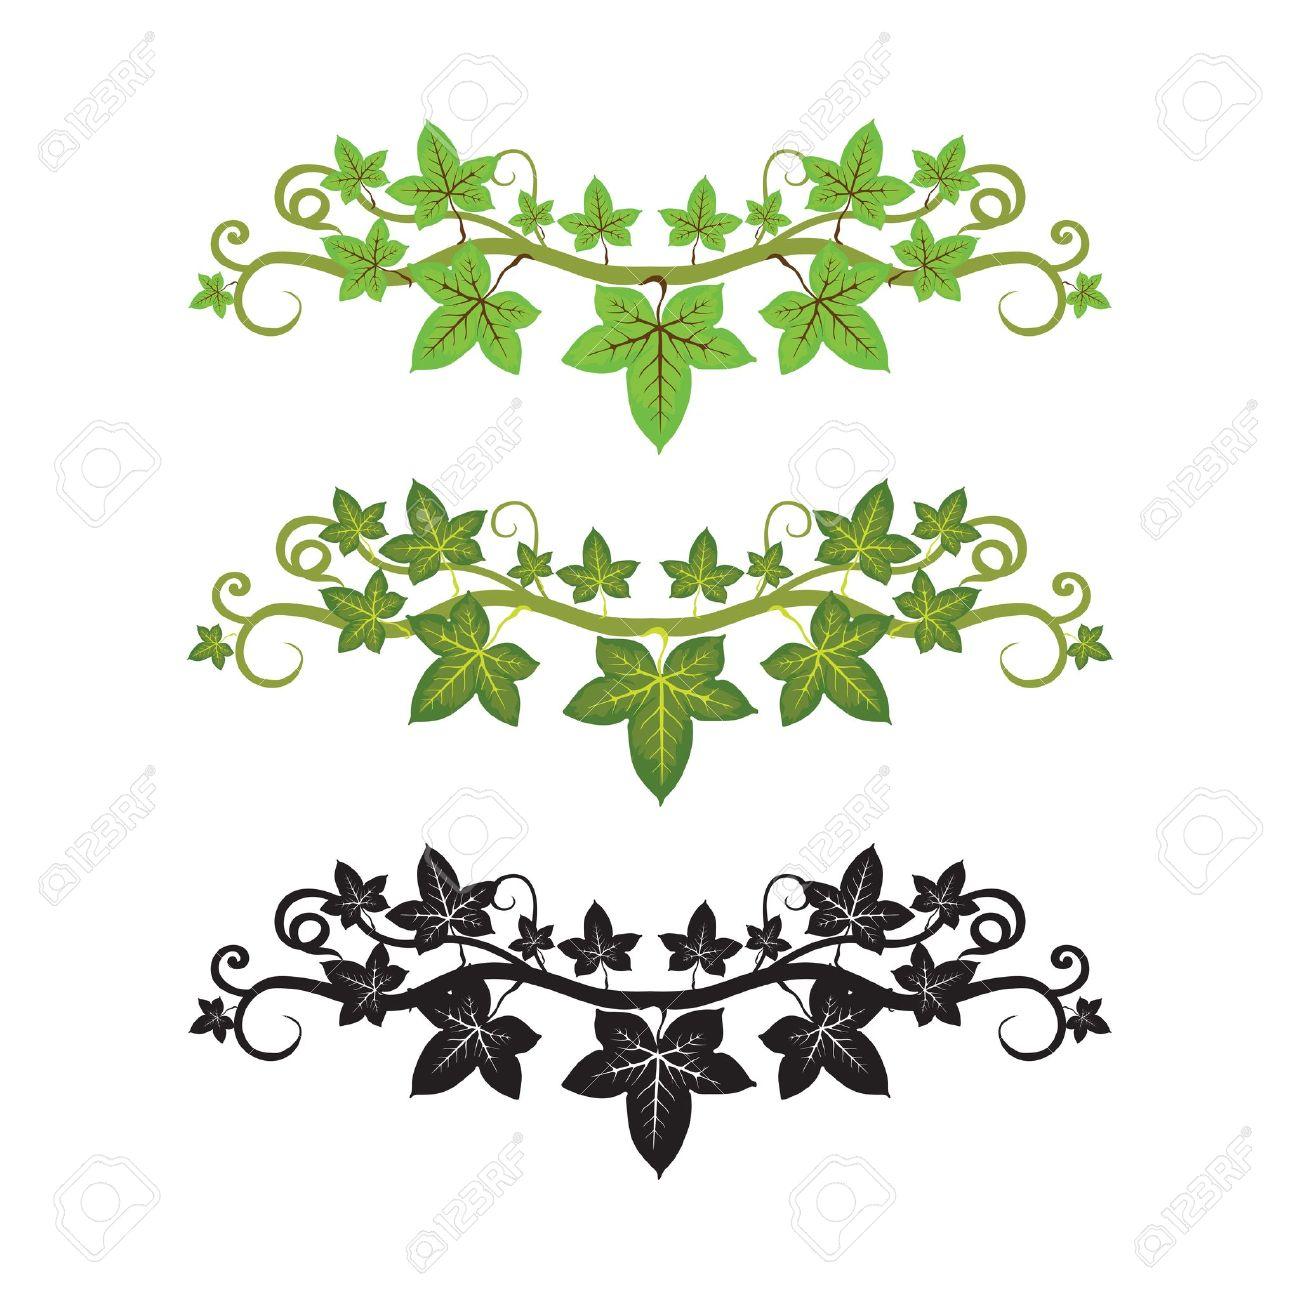 pattern illlusstration of ivy plant Stock Vector - 14225405